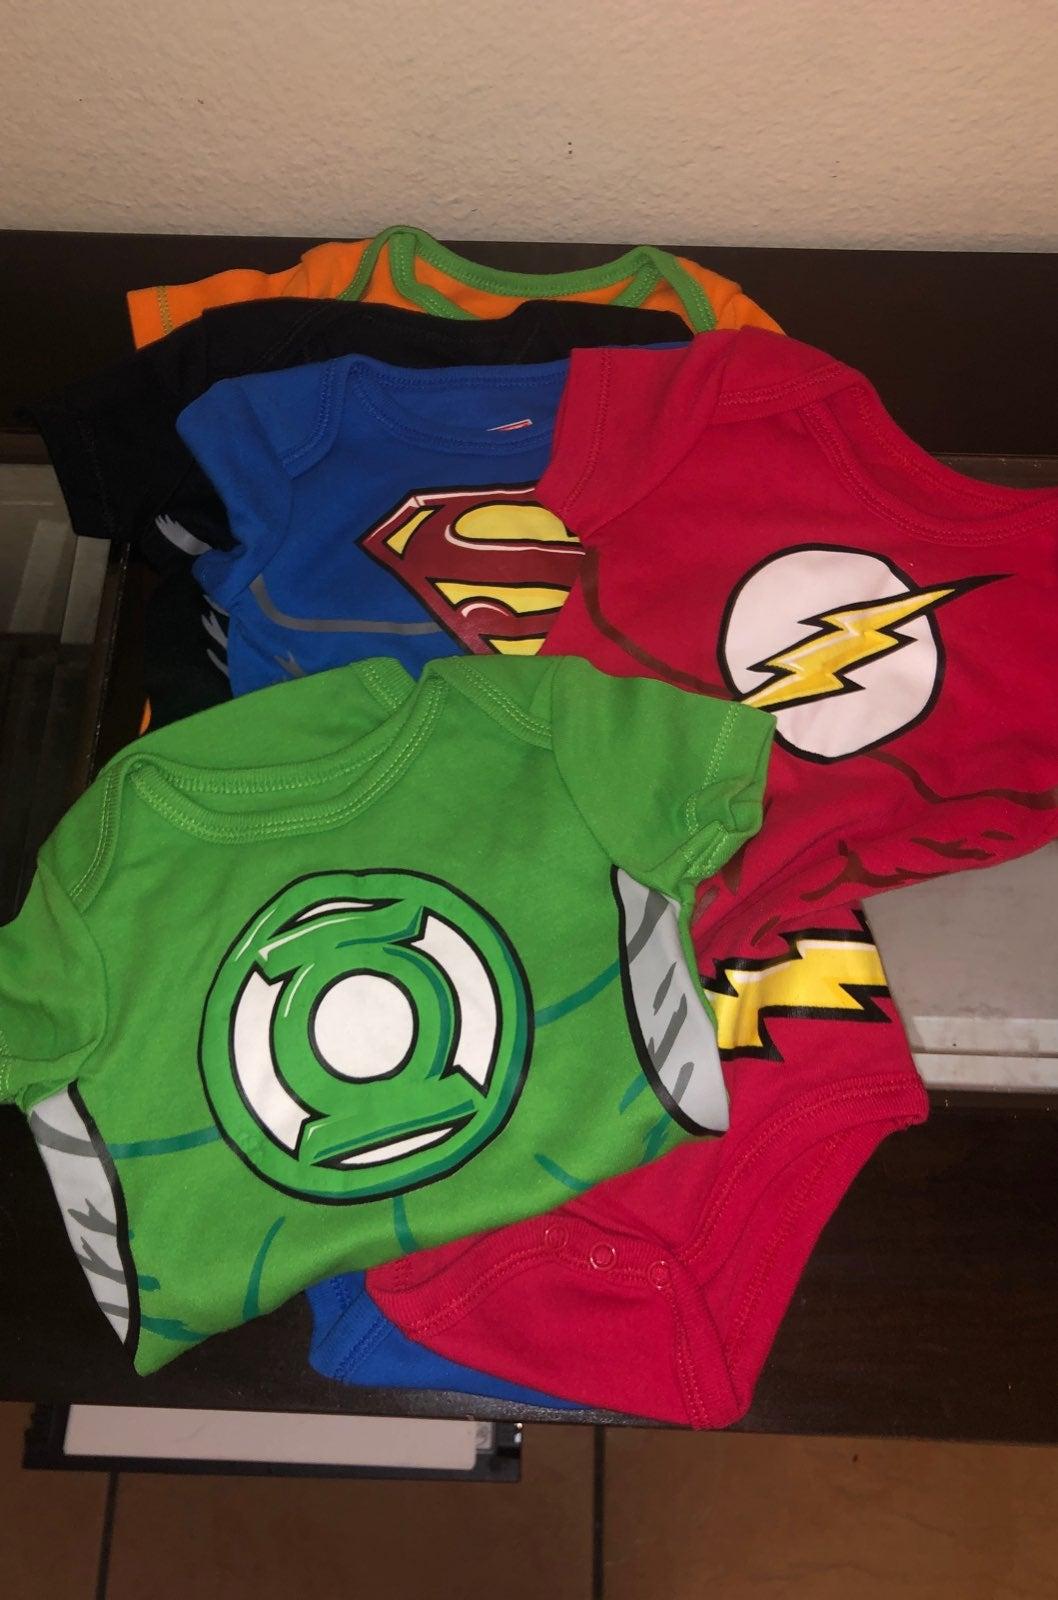 5pk baby DC justice leauge onesie's